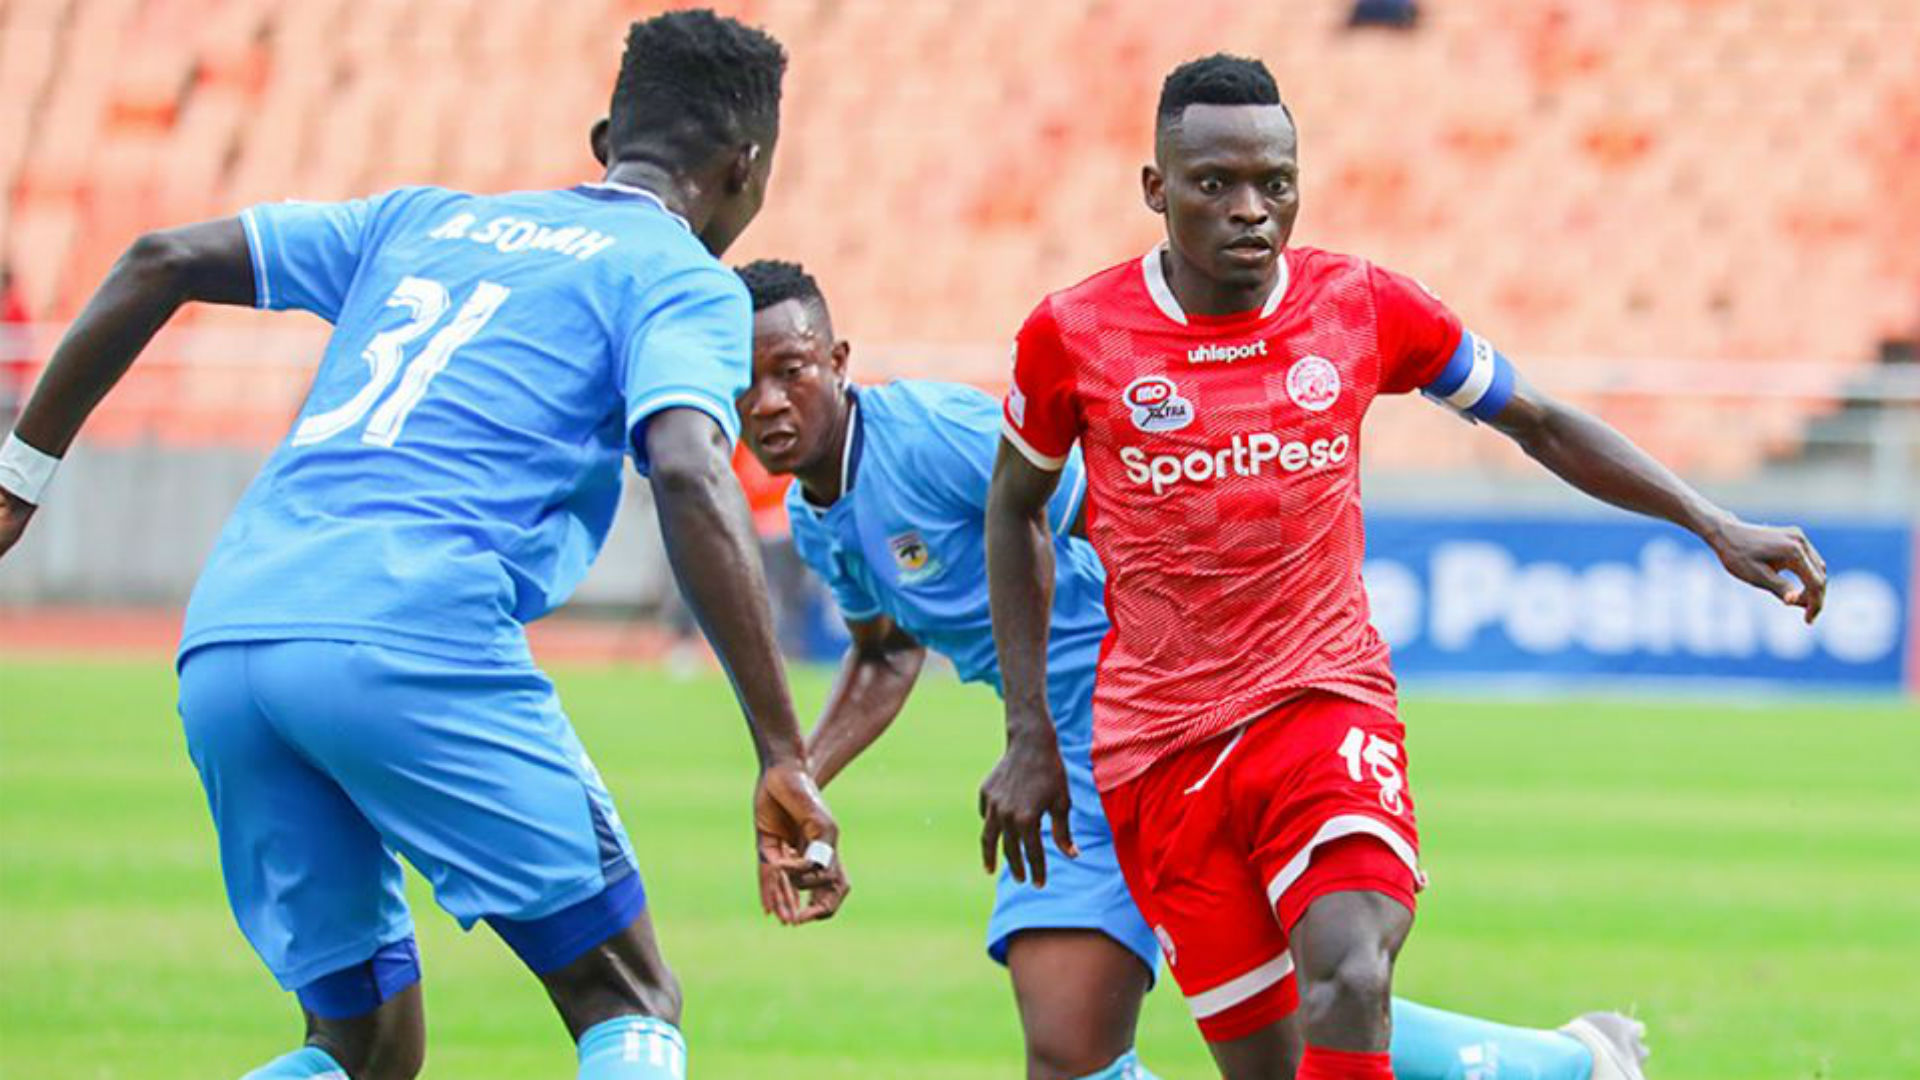 Simba SC coach Vandenbroeck unhappy with players despite Cup win